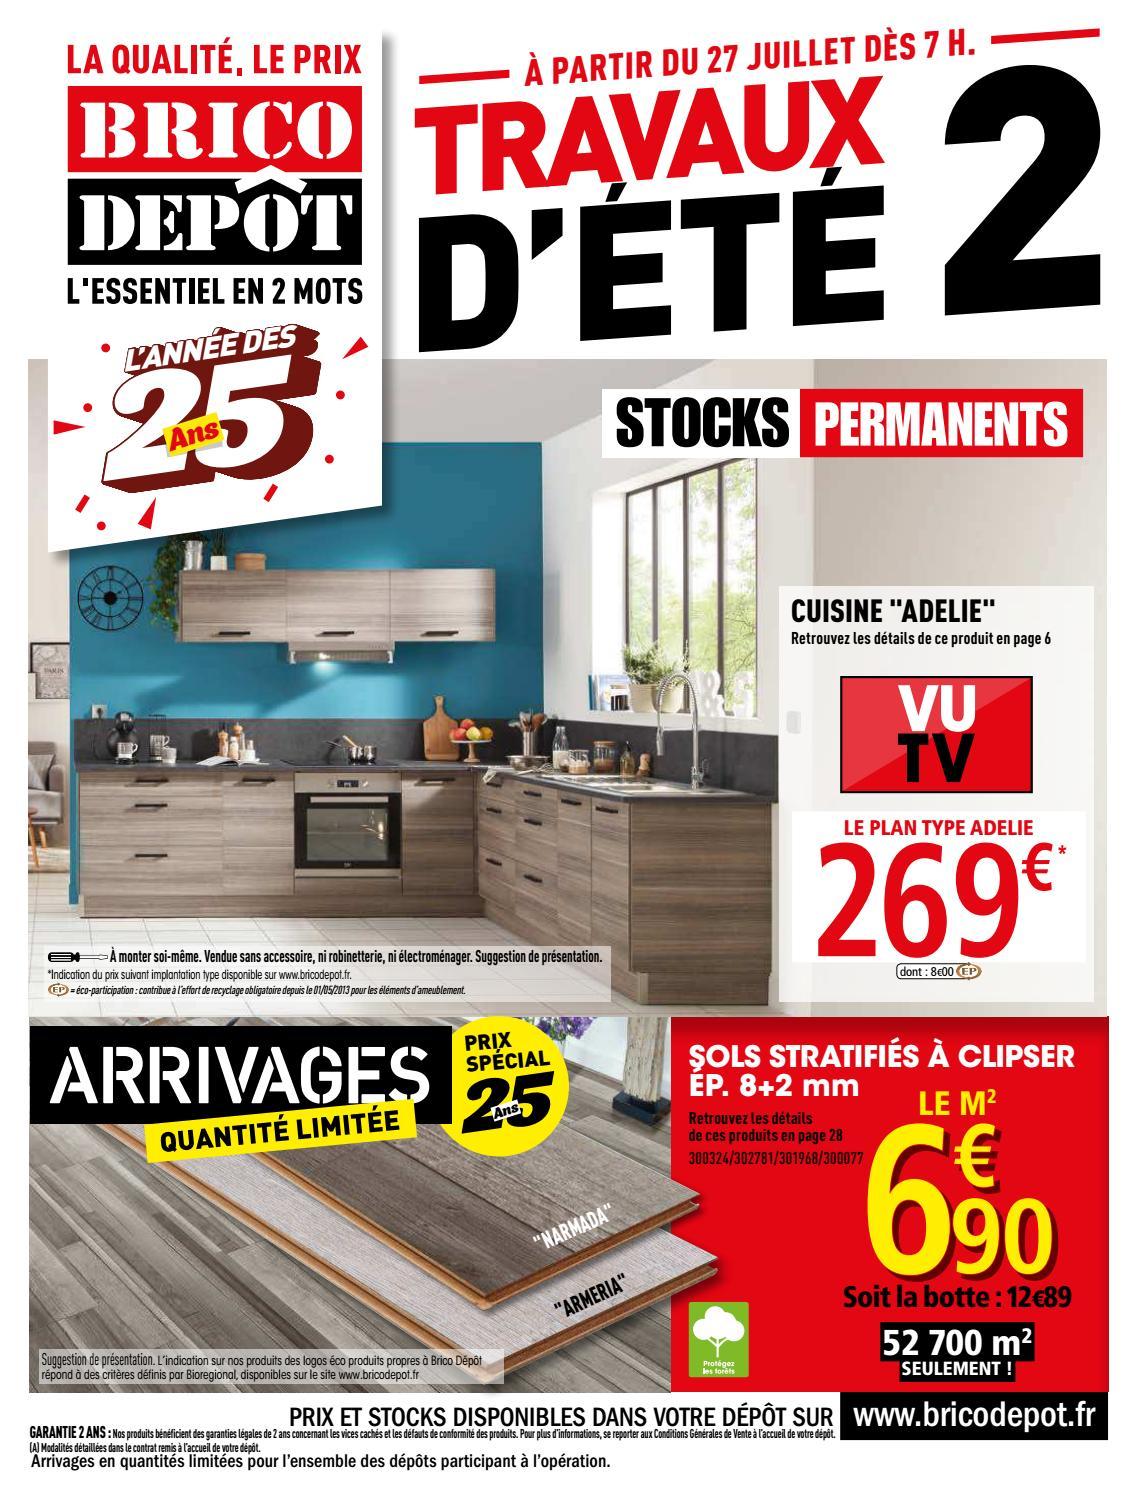 Dep270718_1 By Jan Deo - Issuu dedans Regard Beton 50X50 Brico Depot